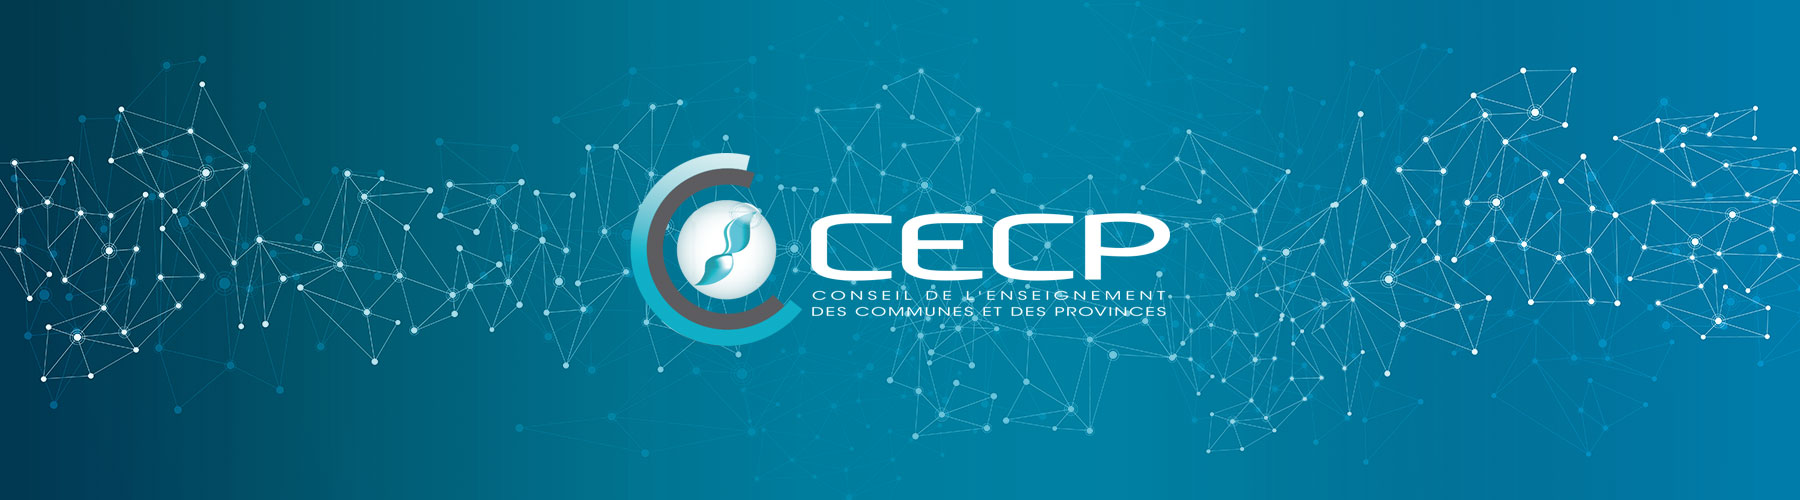 banner3-cecp